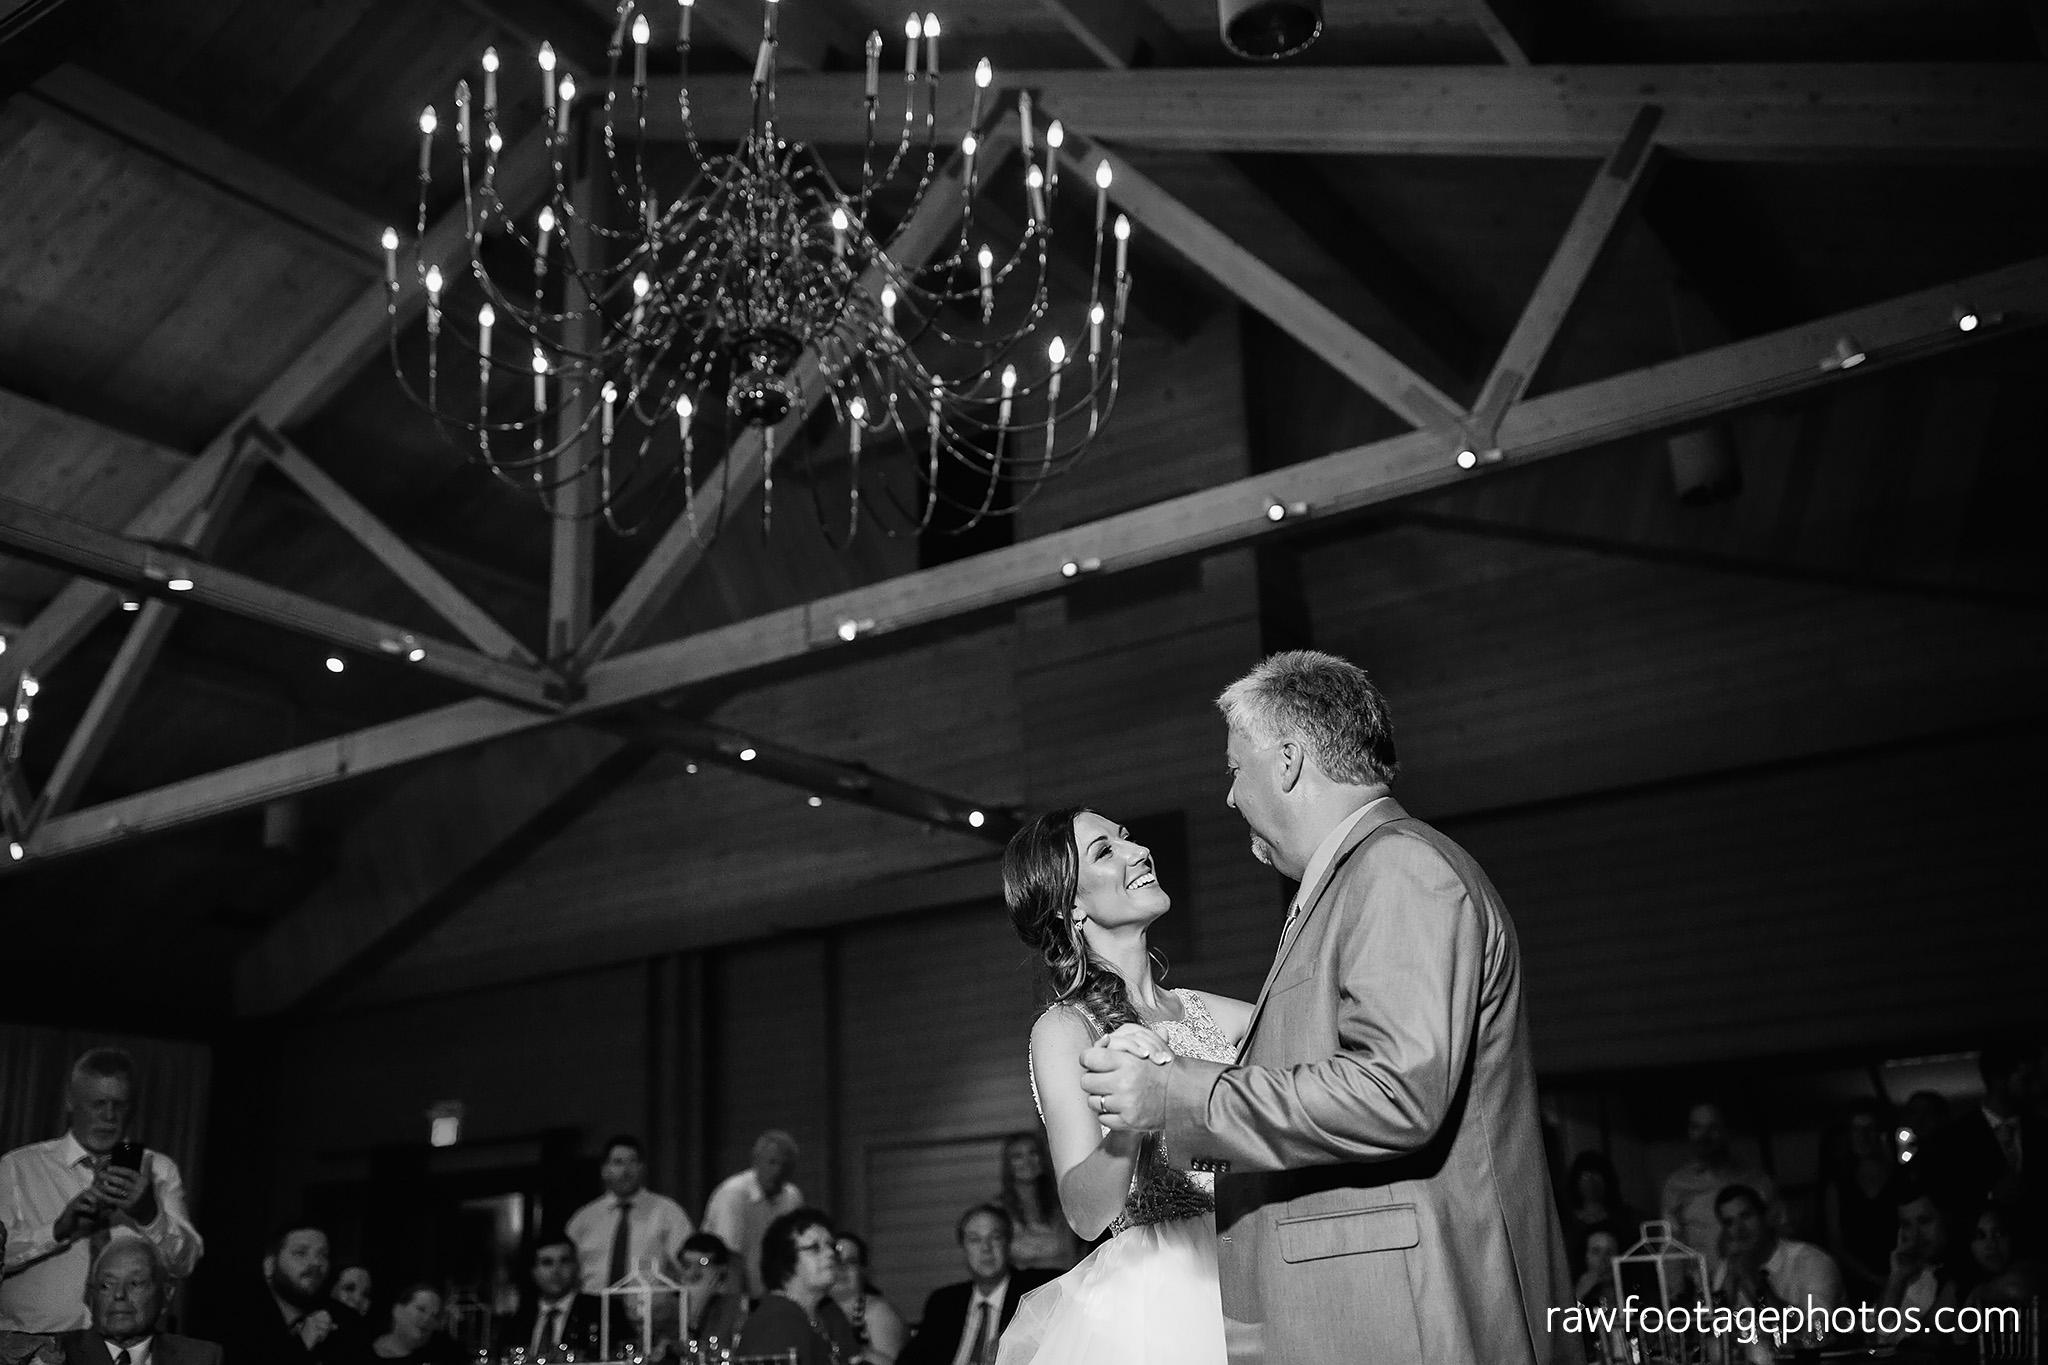 london_ontario_wedding_photographer-grand_bend_wedding_photographer-oakwood_resort_wedding-beach_wedding-sunset_wedding-raw_footage_photography078.jpg